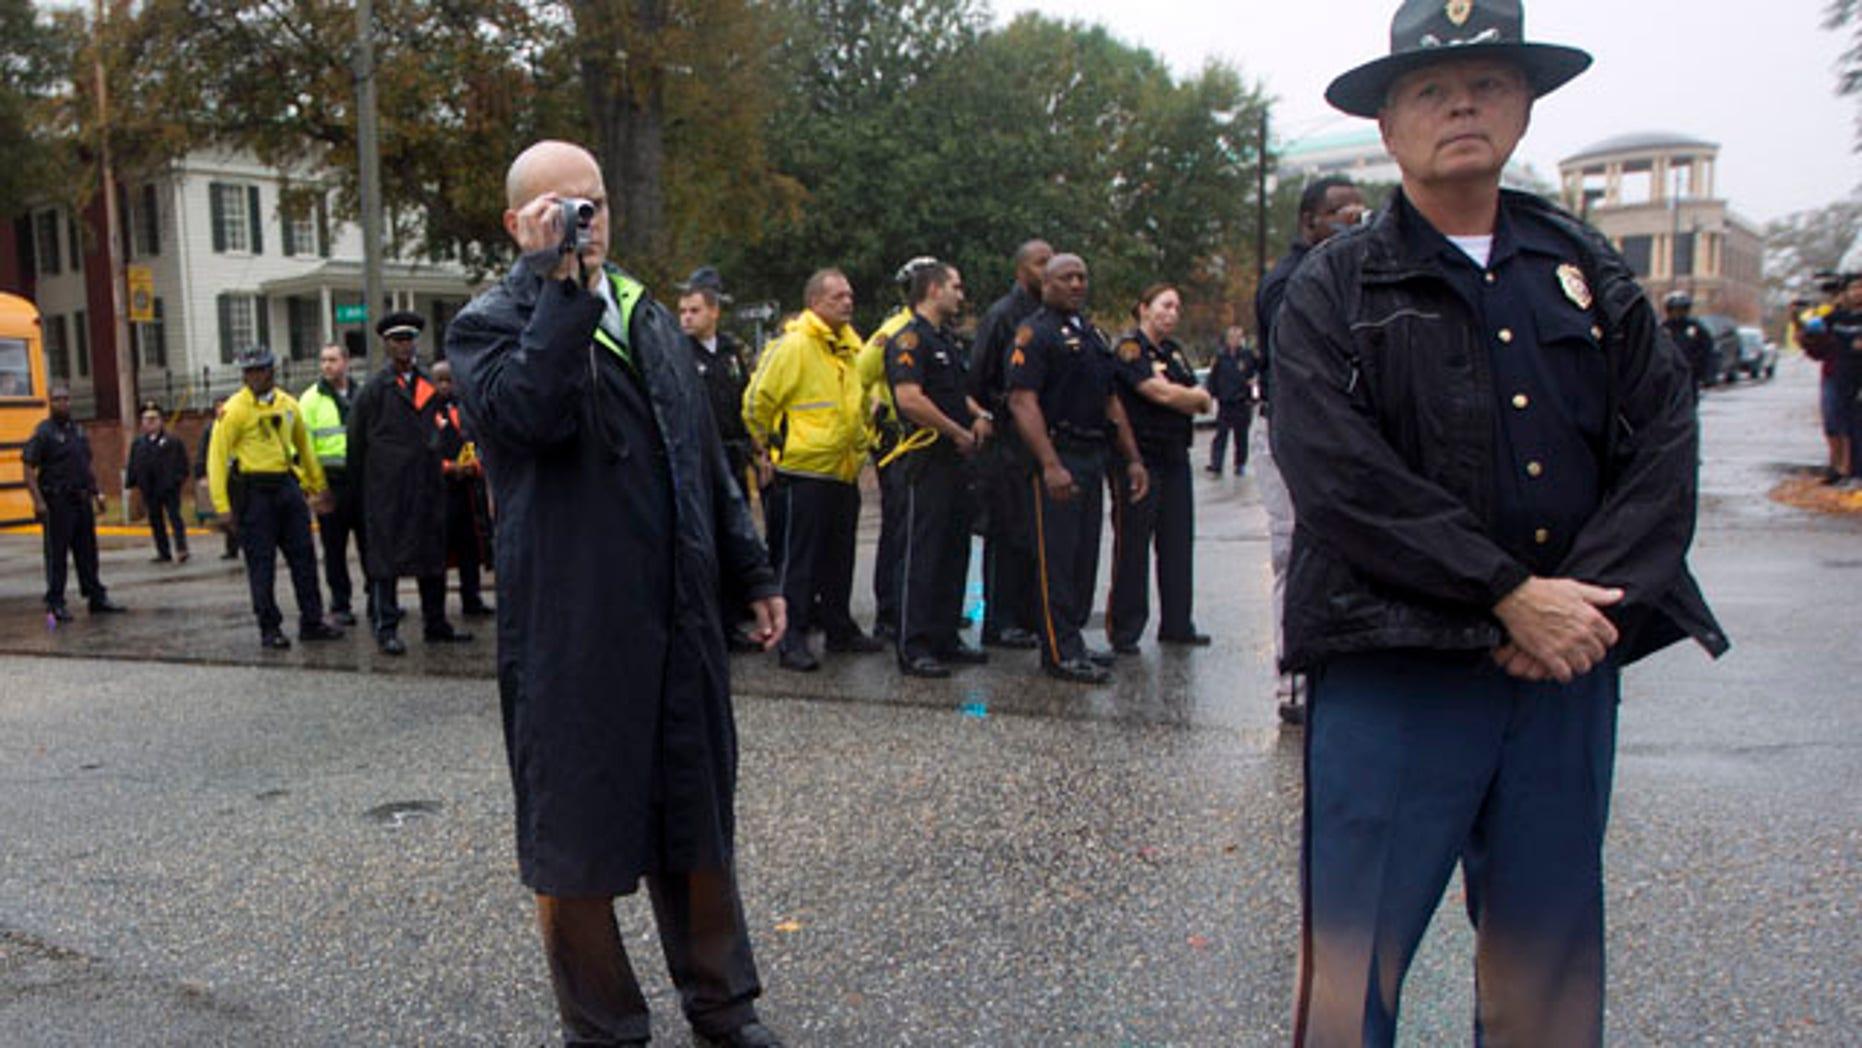 File photo, November 1, 2011. State police prepare to make arrests in protest against Alabama's hardline immigration law. (AP/Dave Martin)